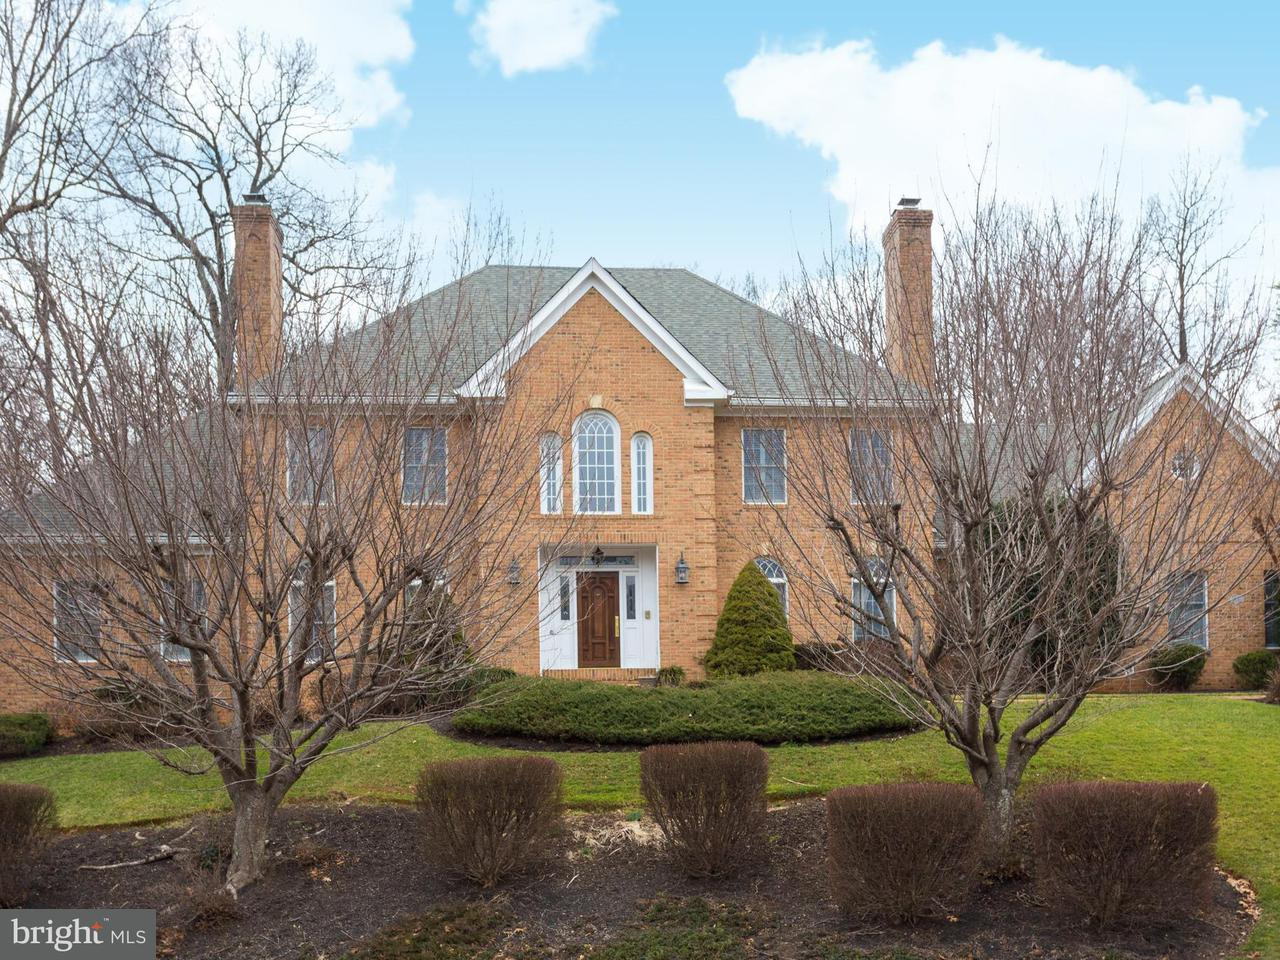 獨棟家庭住宅 為 出售 在 10604 HANNAH FARM Road 10604 HANNAH FARM Road Oakton, 弗吉尼亞州 22124 美國